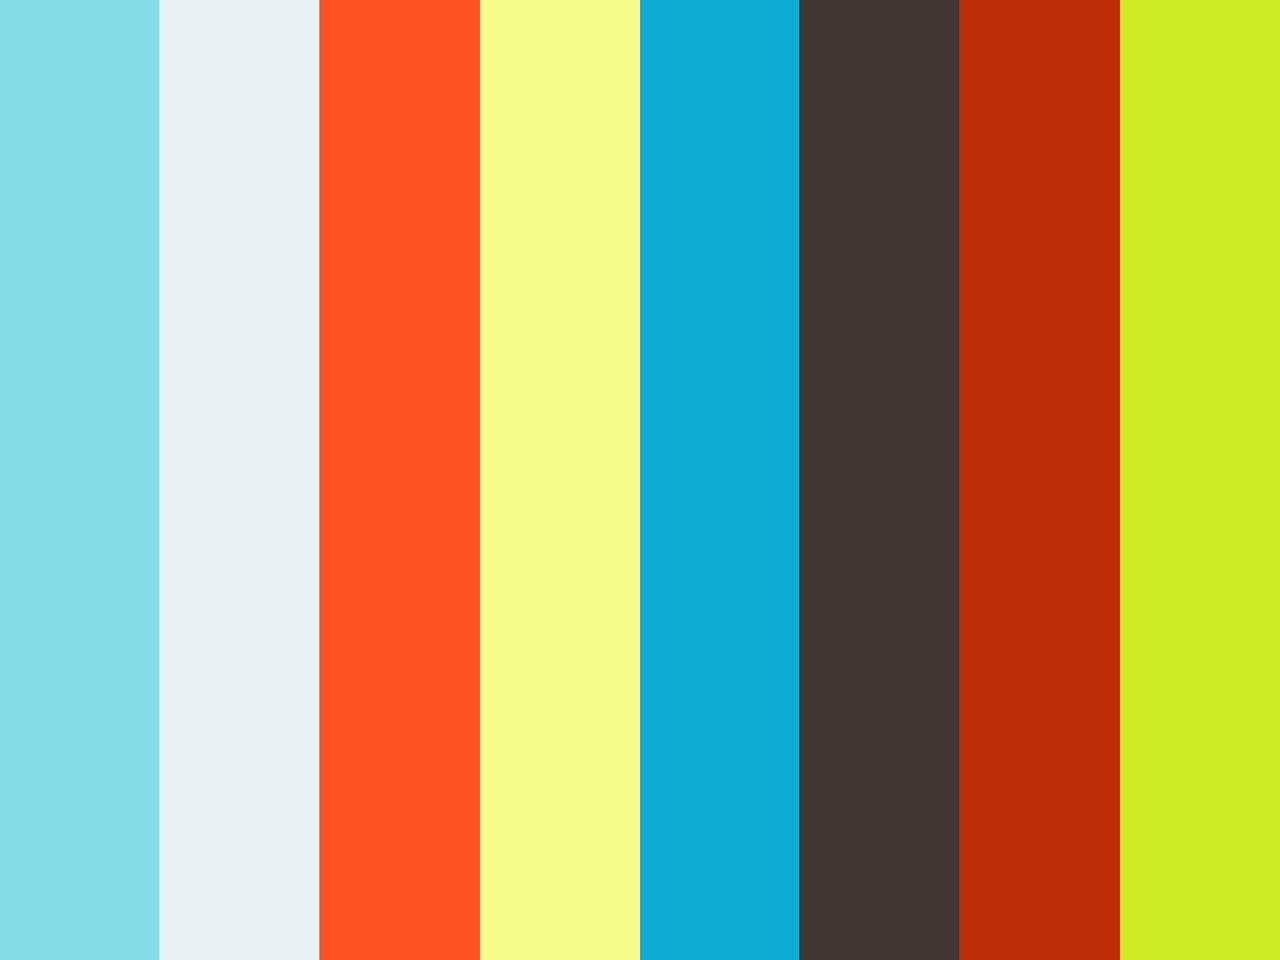 Bud Light SuperBowl XLIX ad - Real Life PacMan (2015)